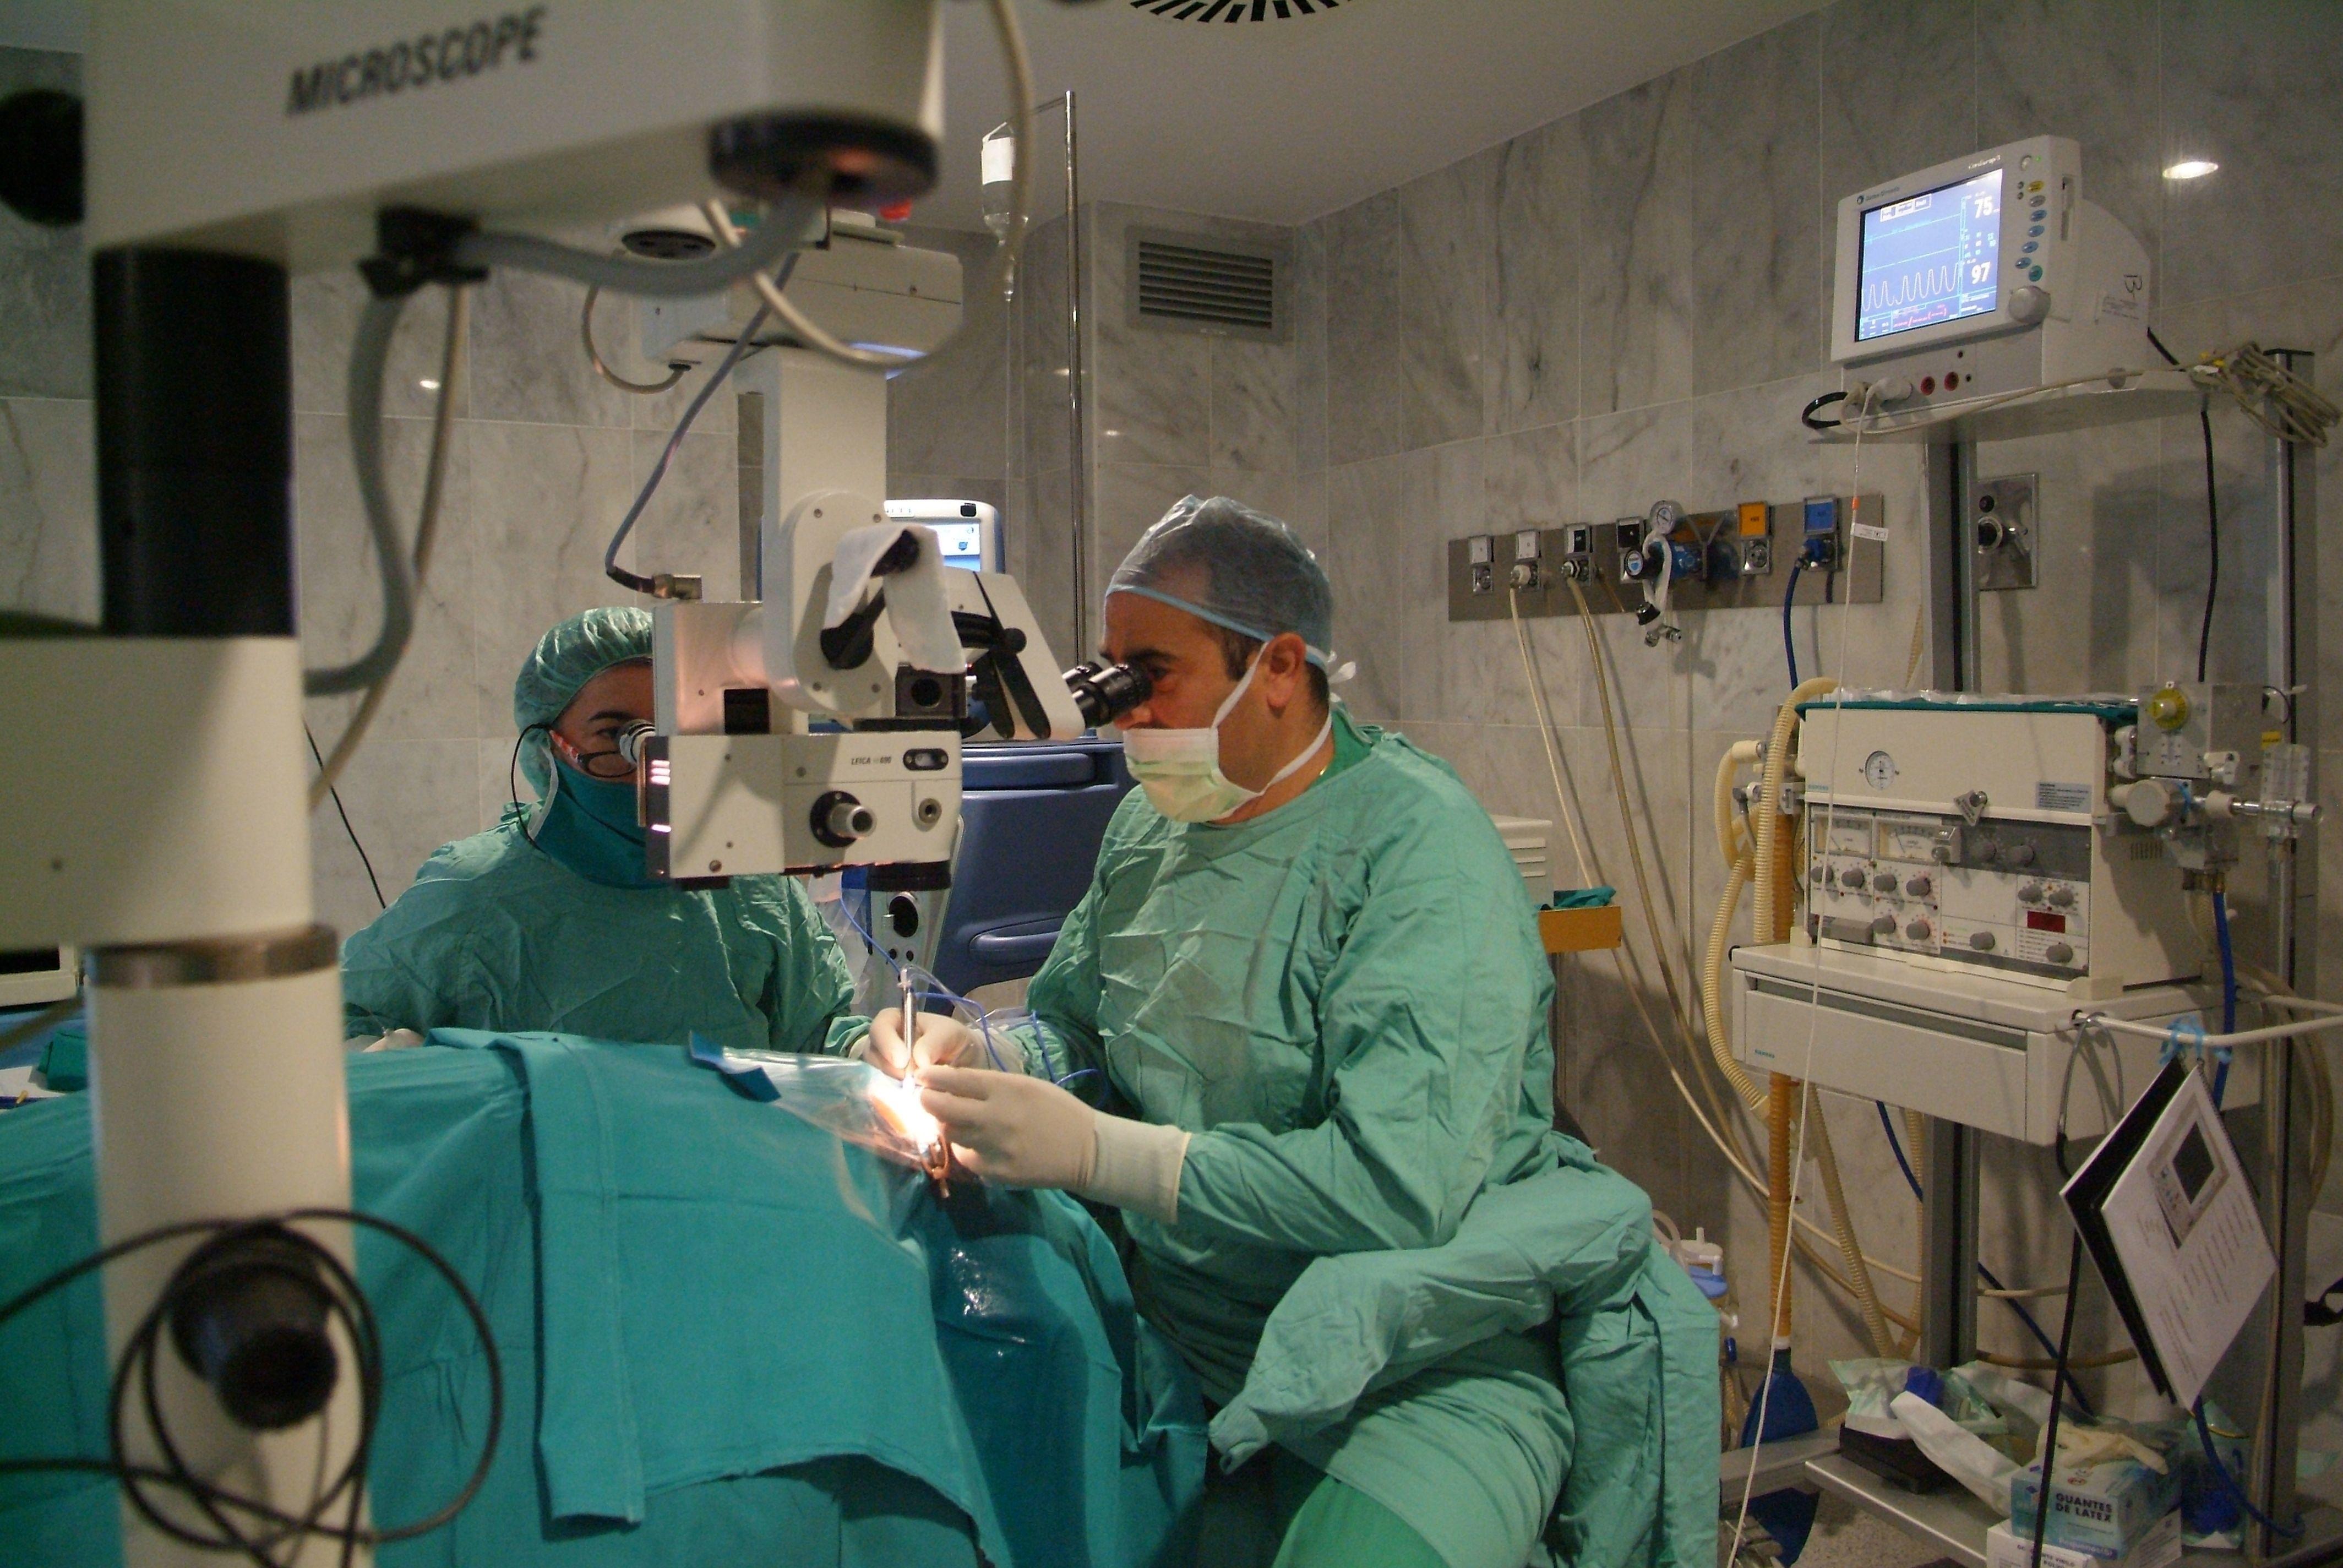 Microcirugía ocular